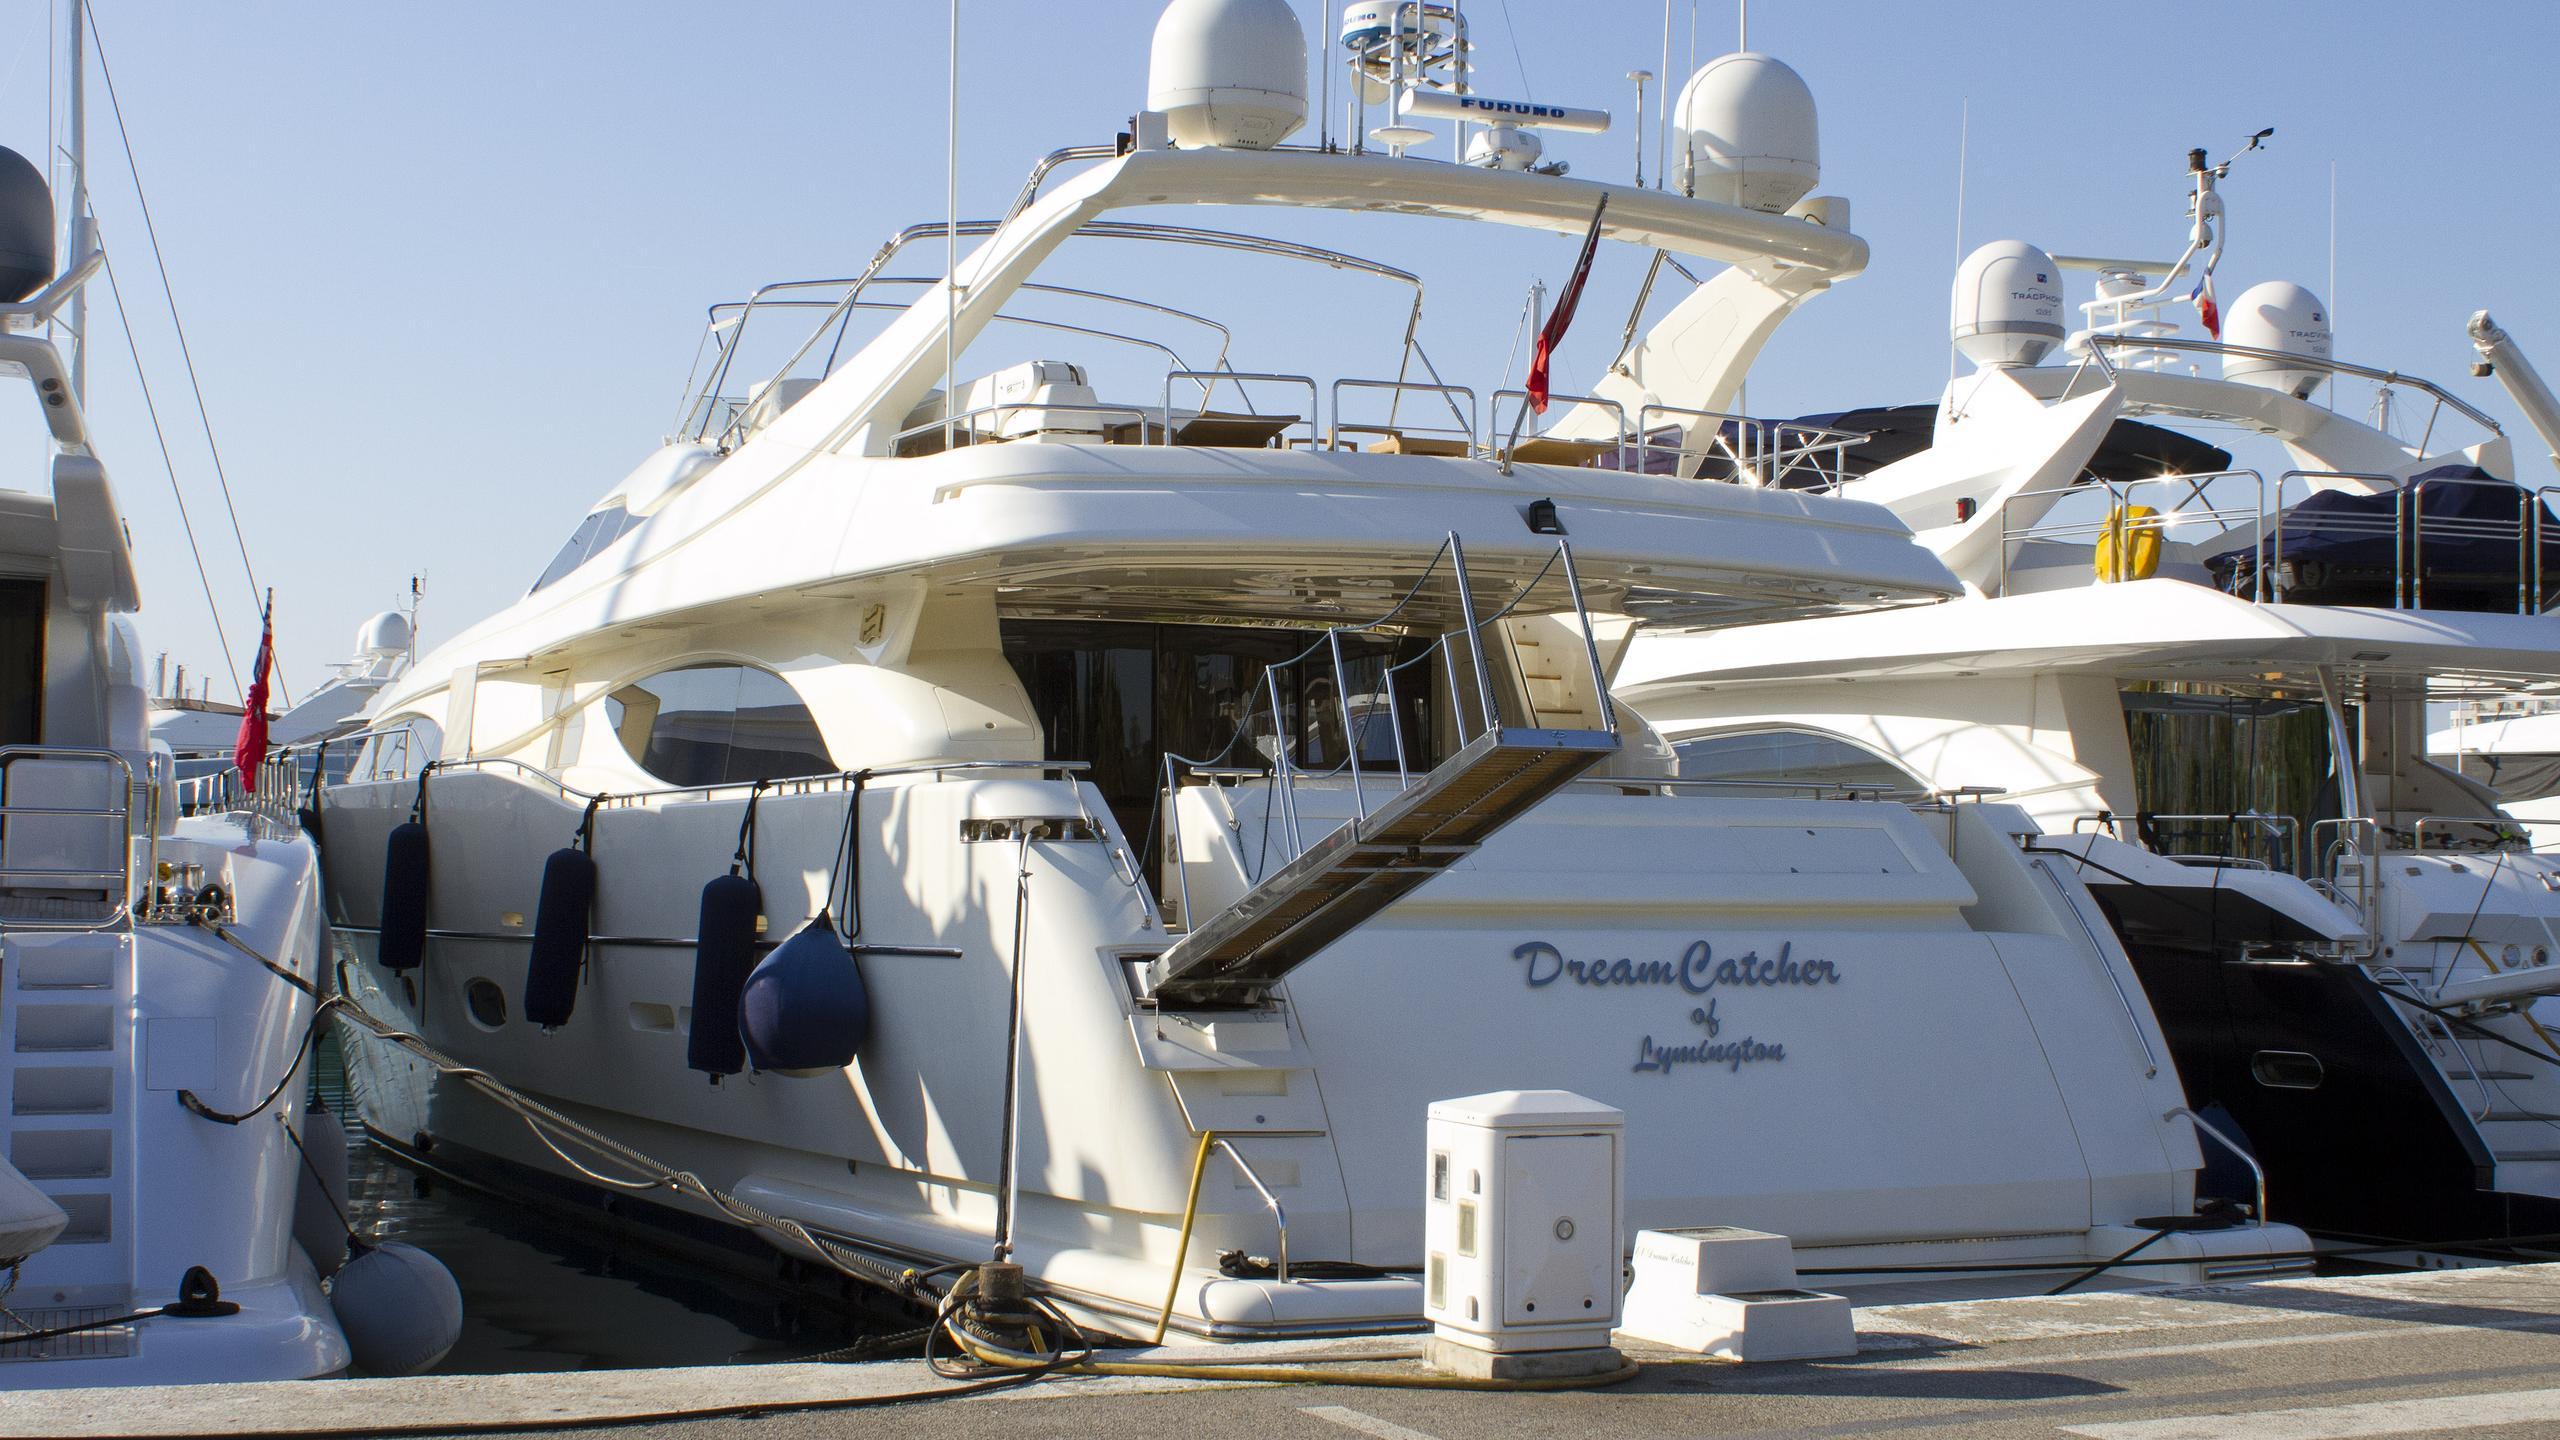 dreamcatcher-motor-yacht-ferretti-custom-line-94-2004-29m-stern